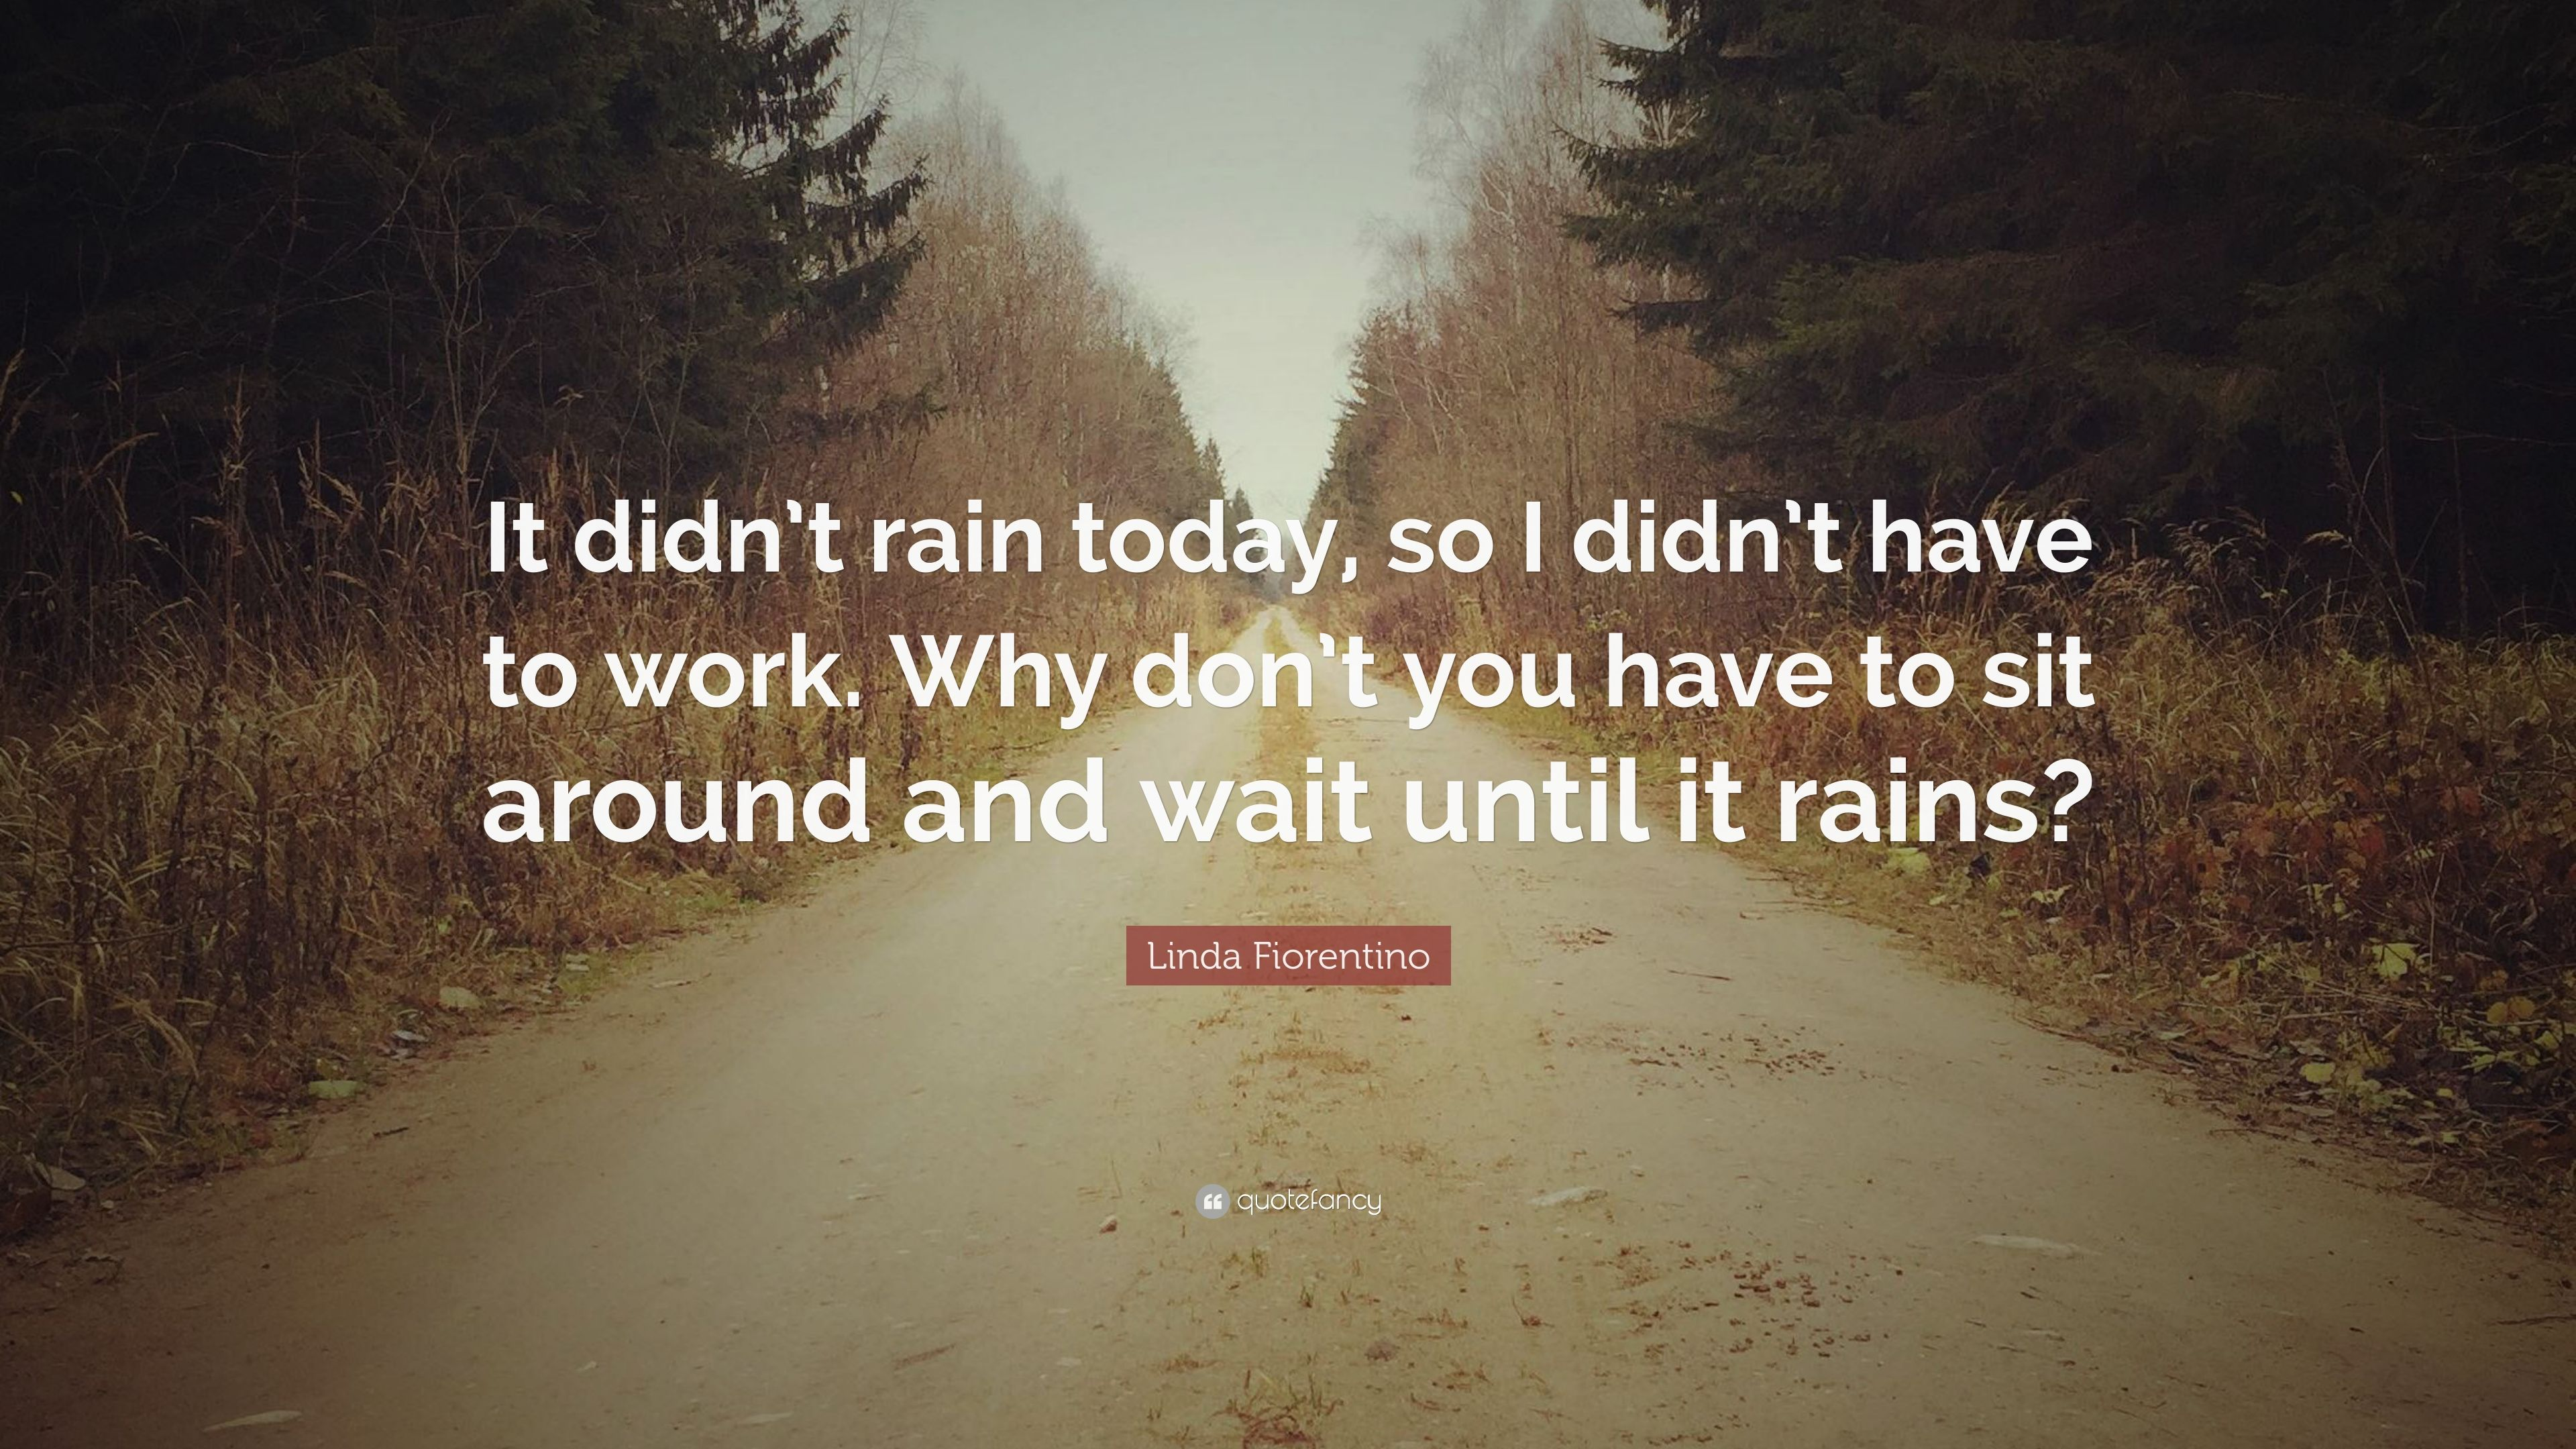 Beautiful Linda Fiorentino Quote: U201cIt Didnu0027t Rain Today, So I Didnu0027